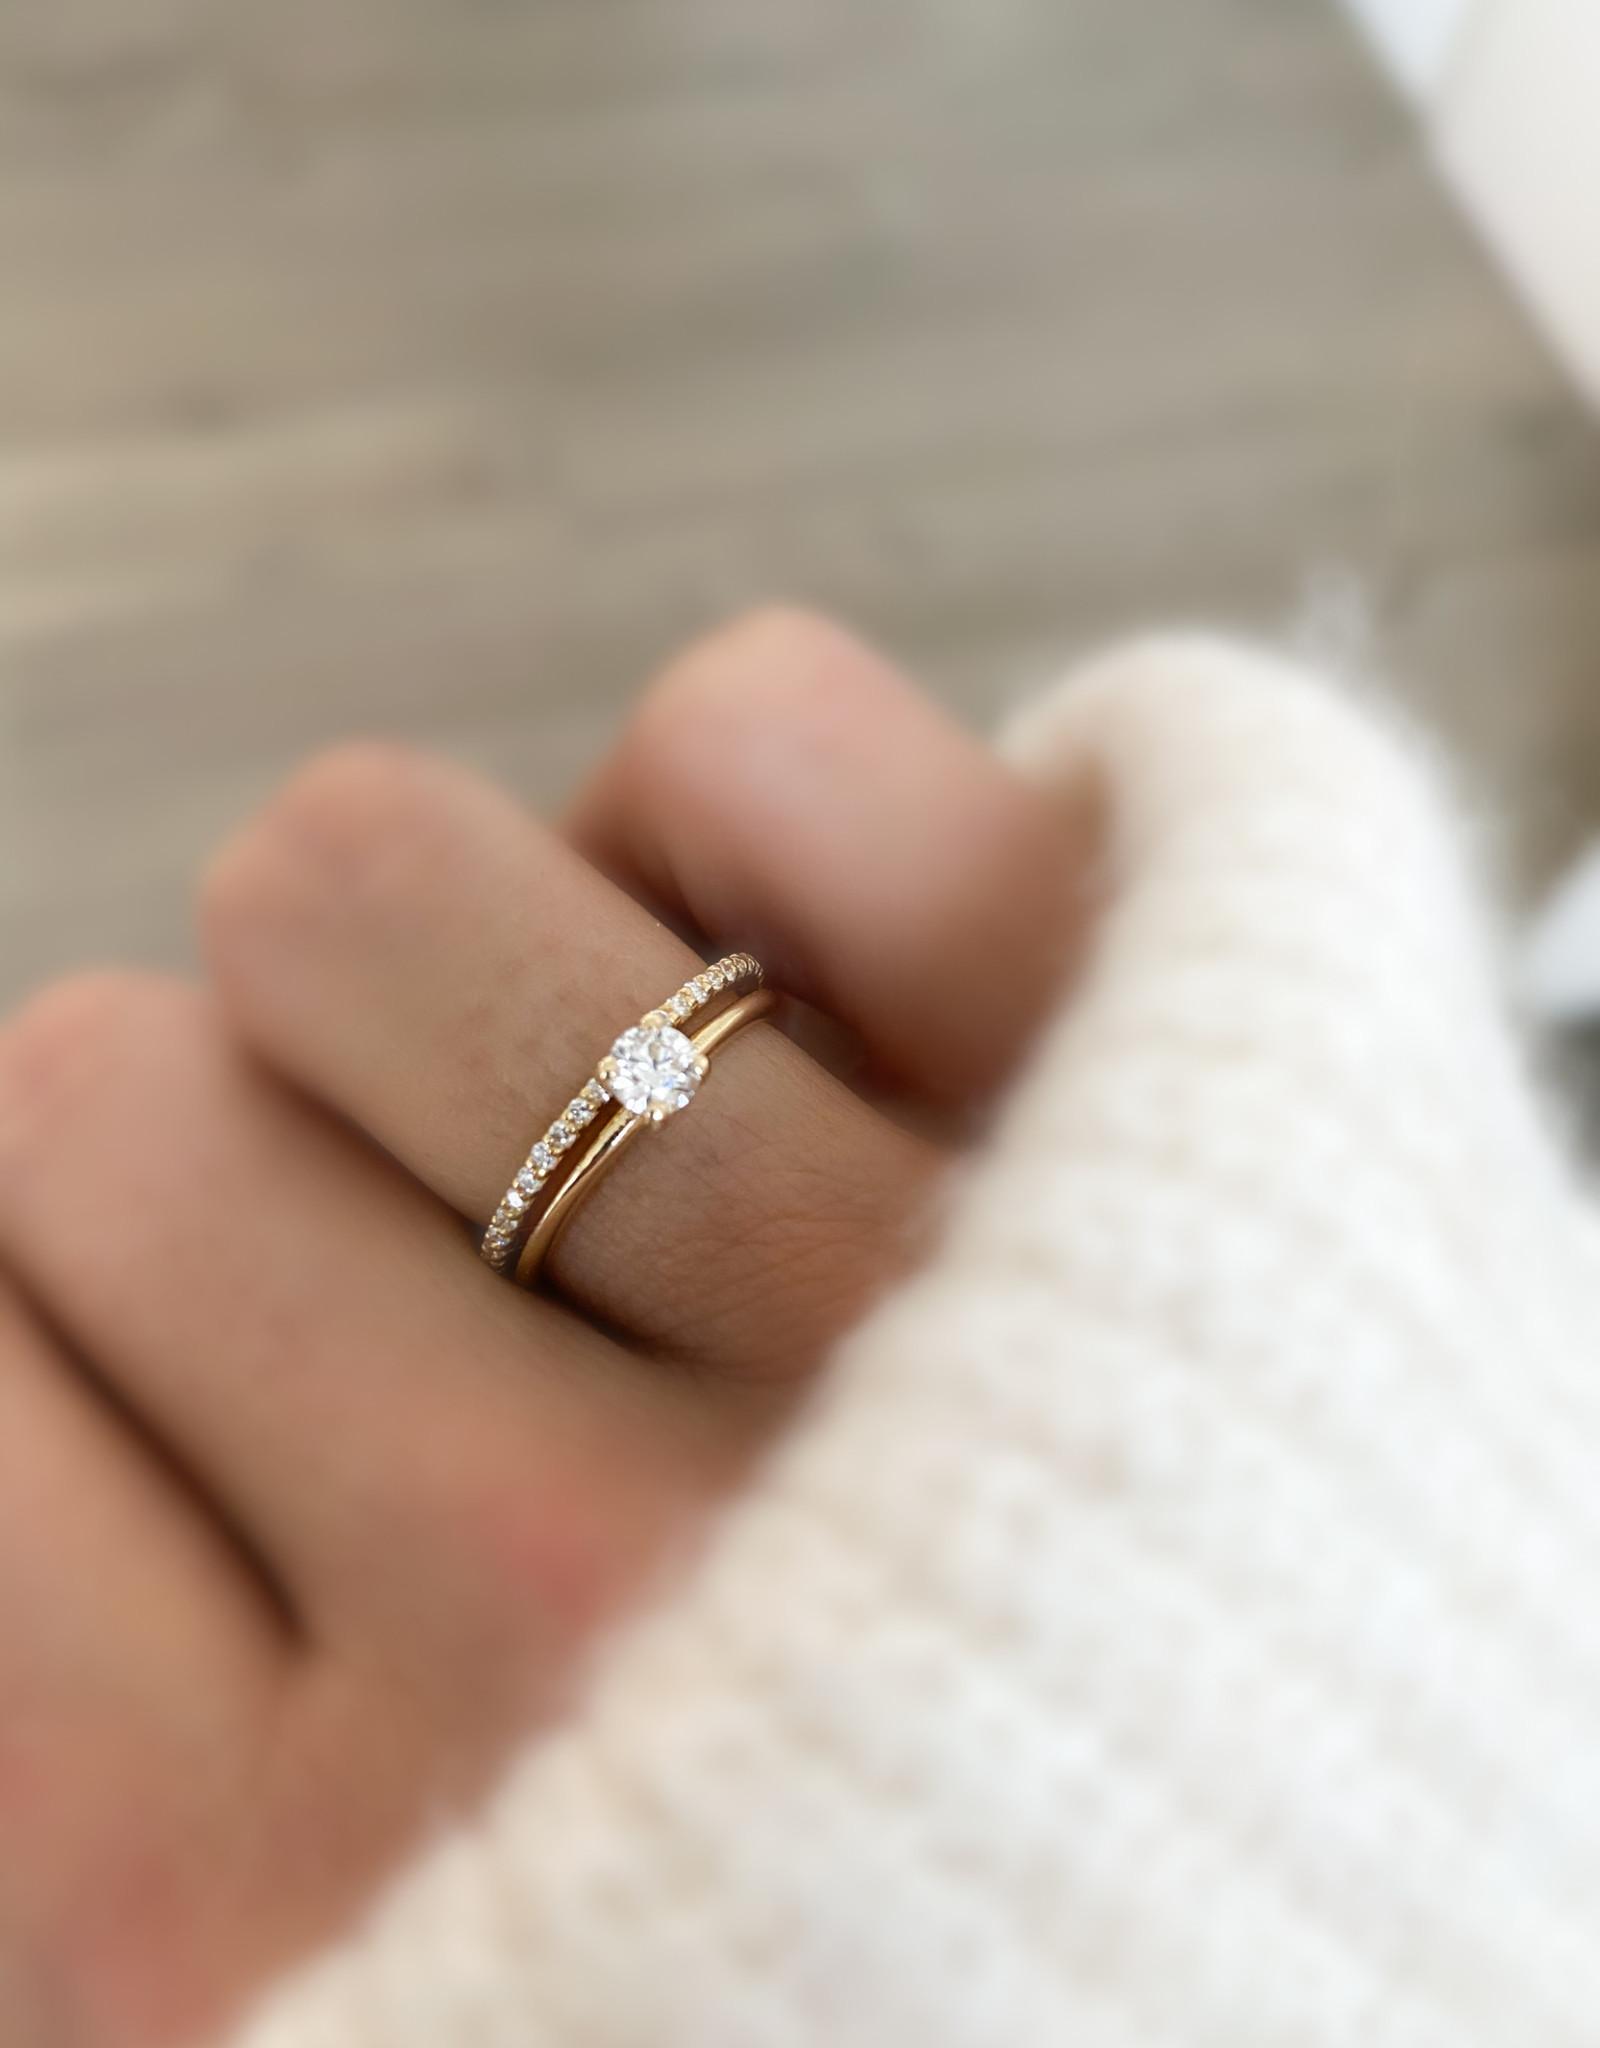 Atelier Maison The One - geel goud - diamant